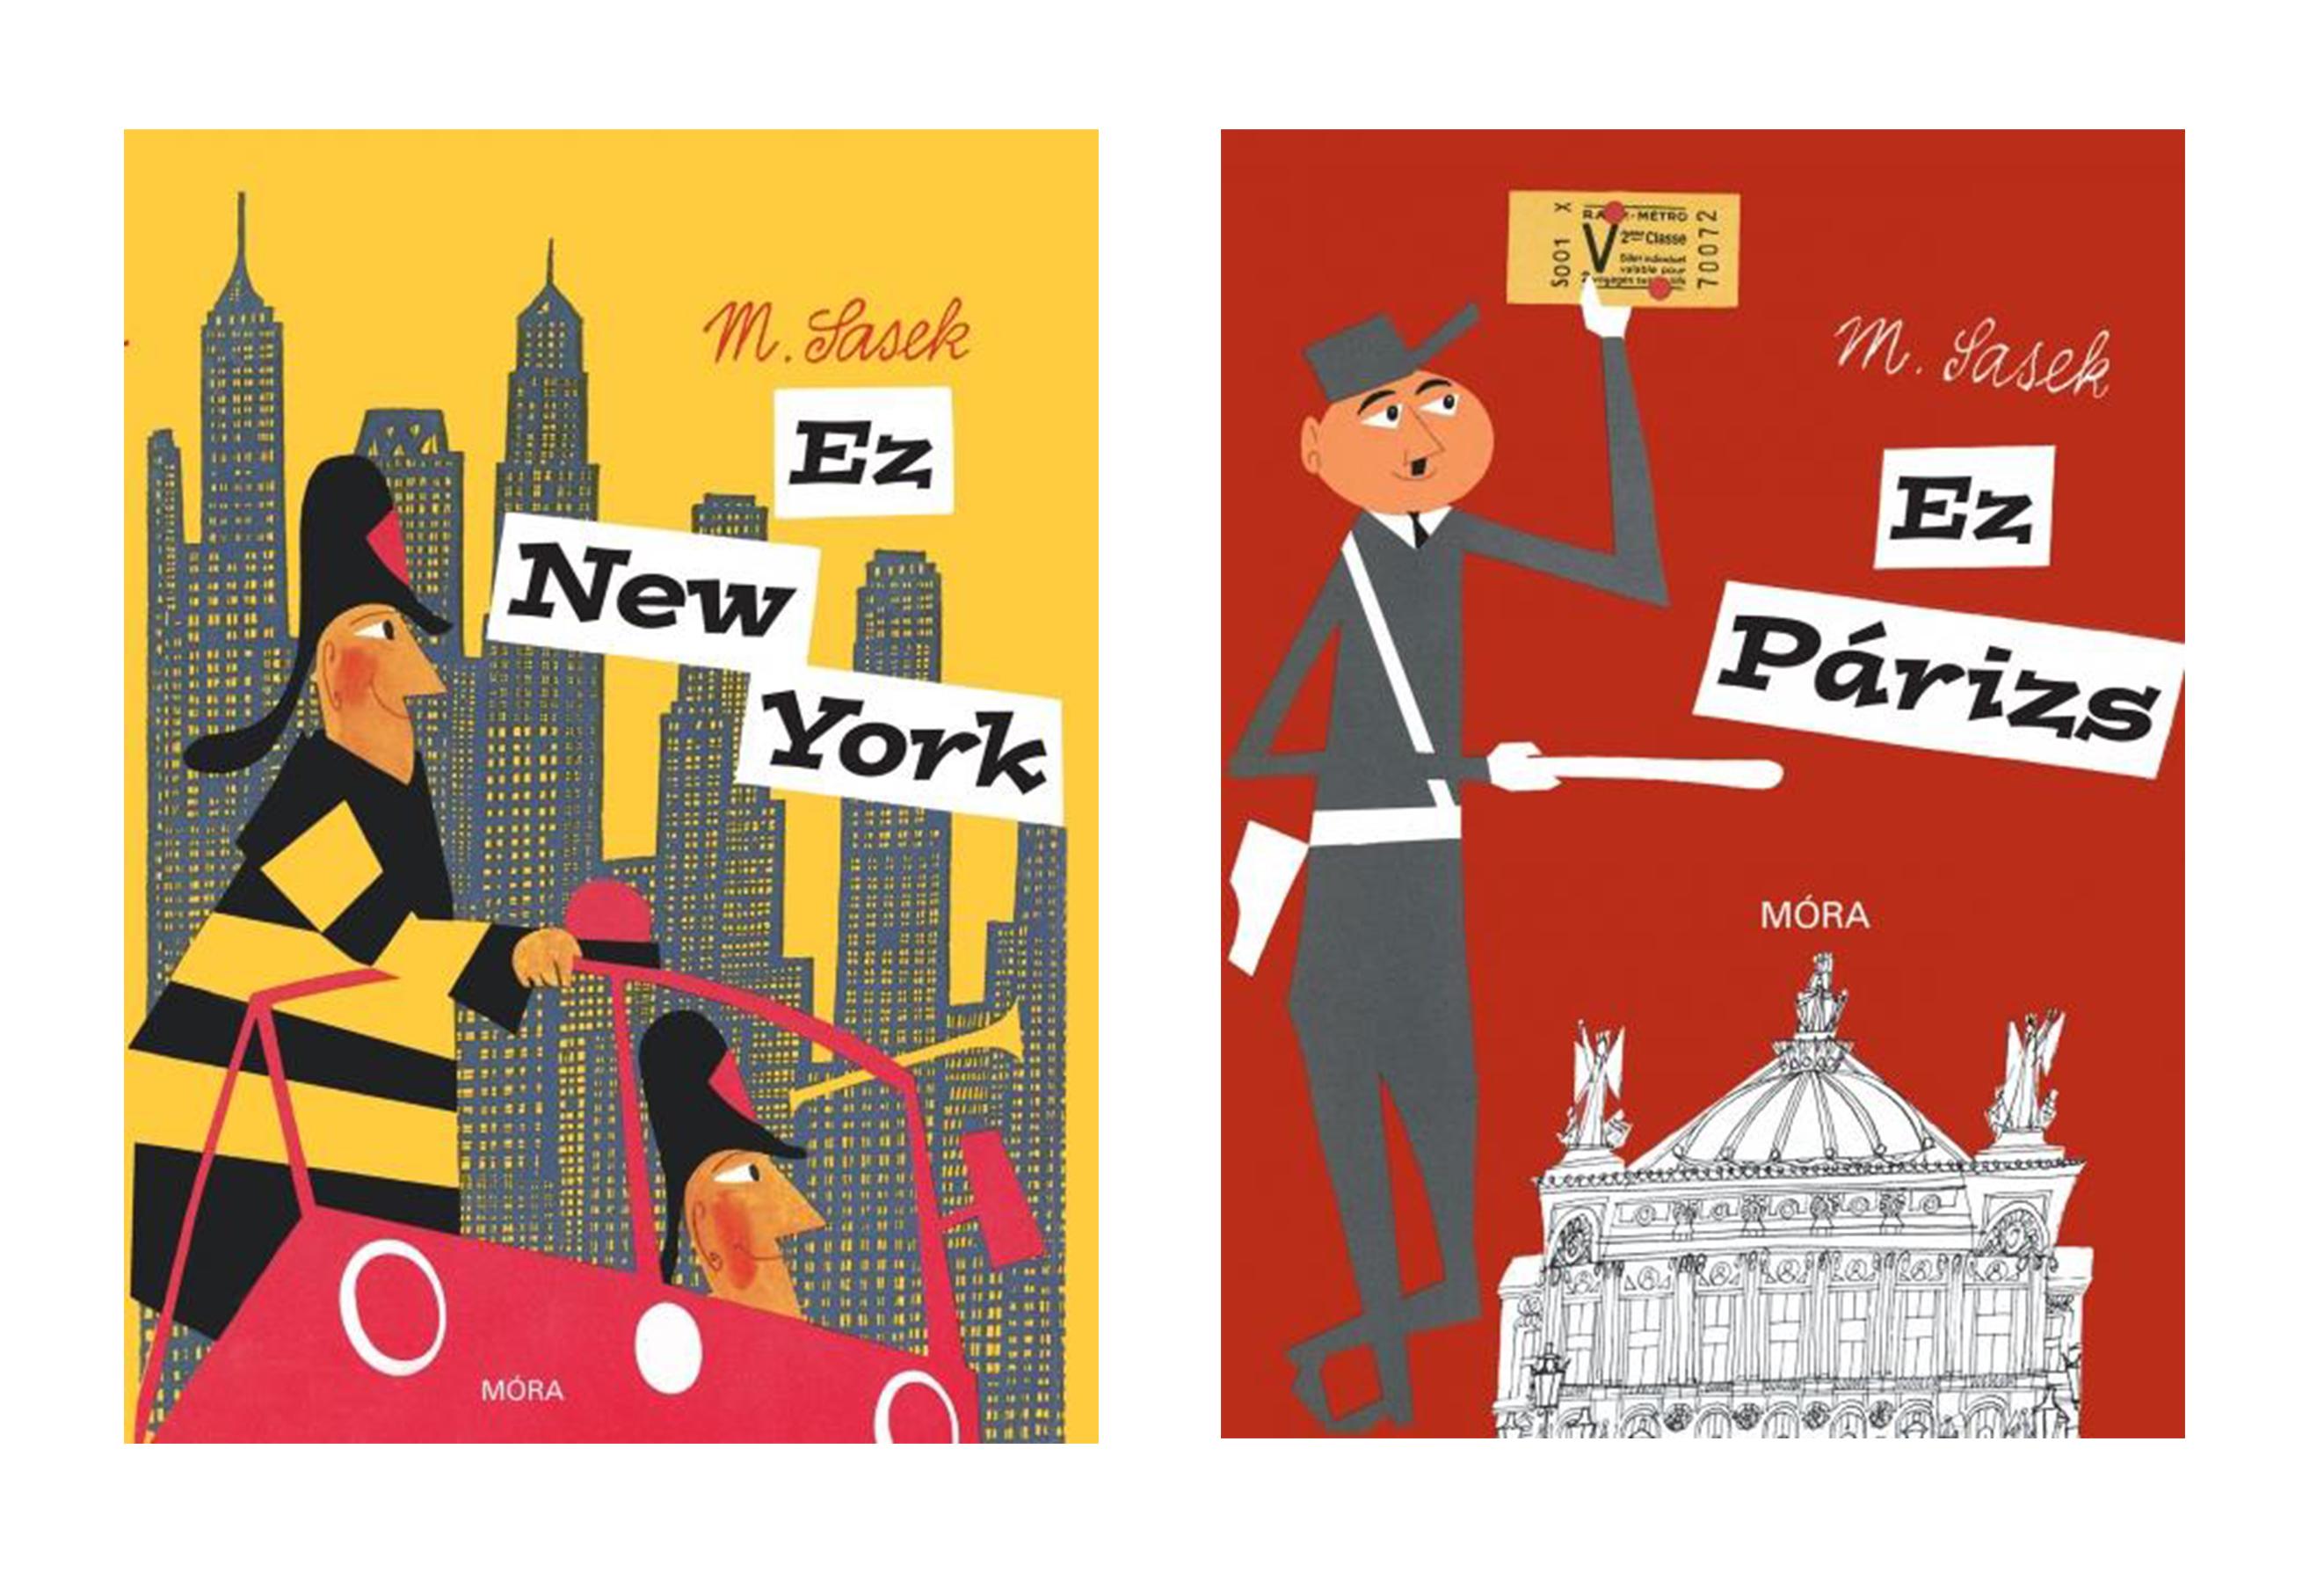 ez_new_york_ez_pa_rizs.jpg